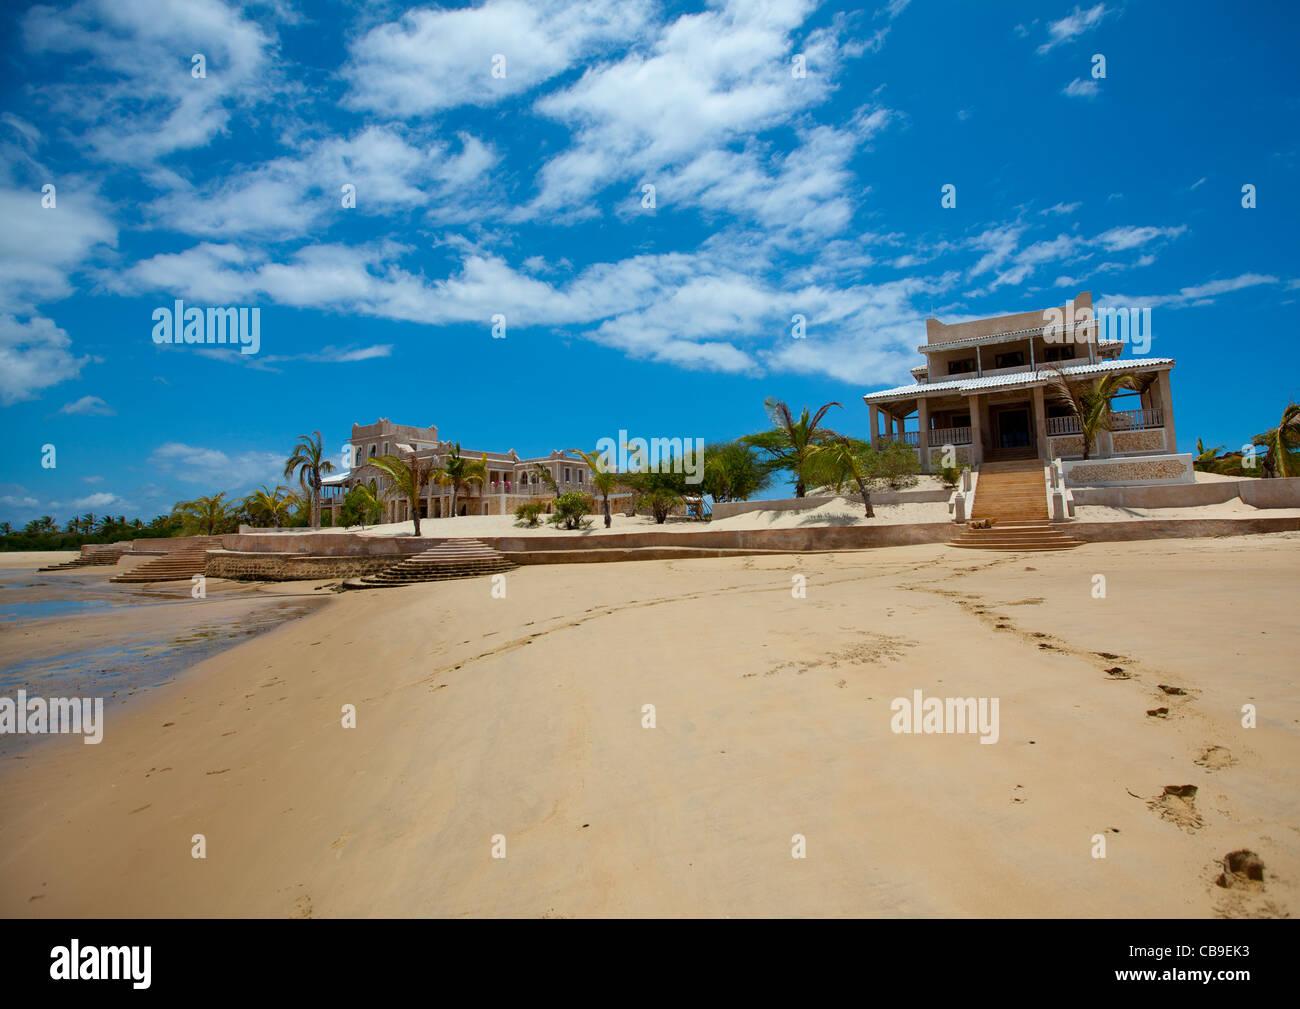 delajoux house near beach luxury travel destination place - Stock Image